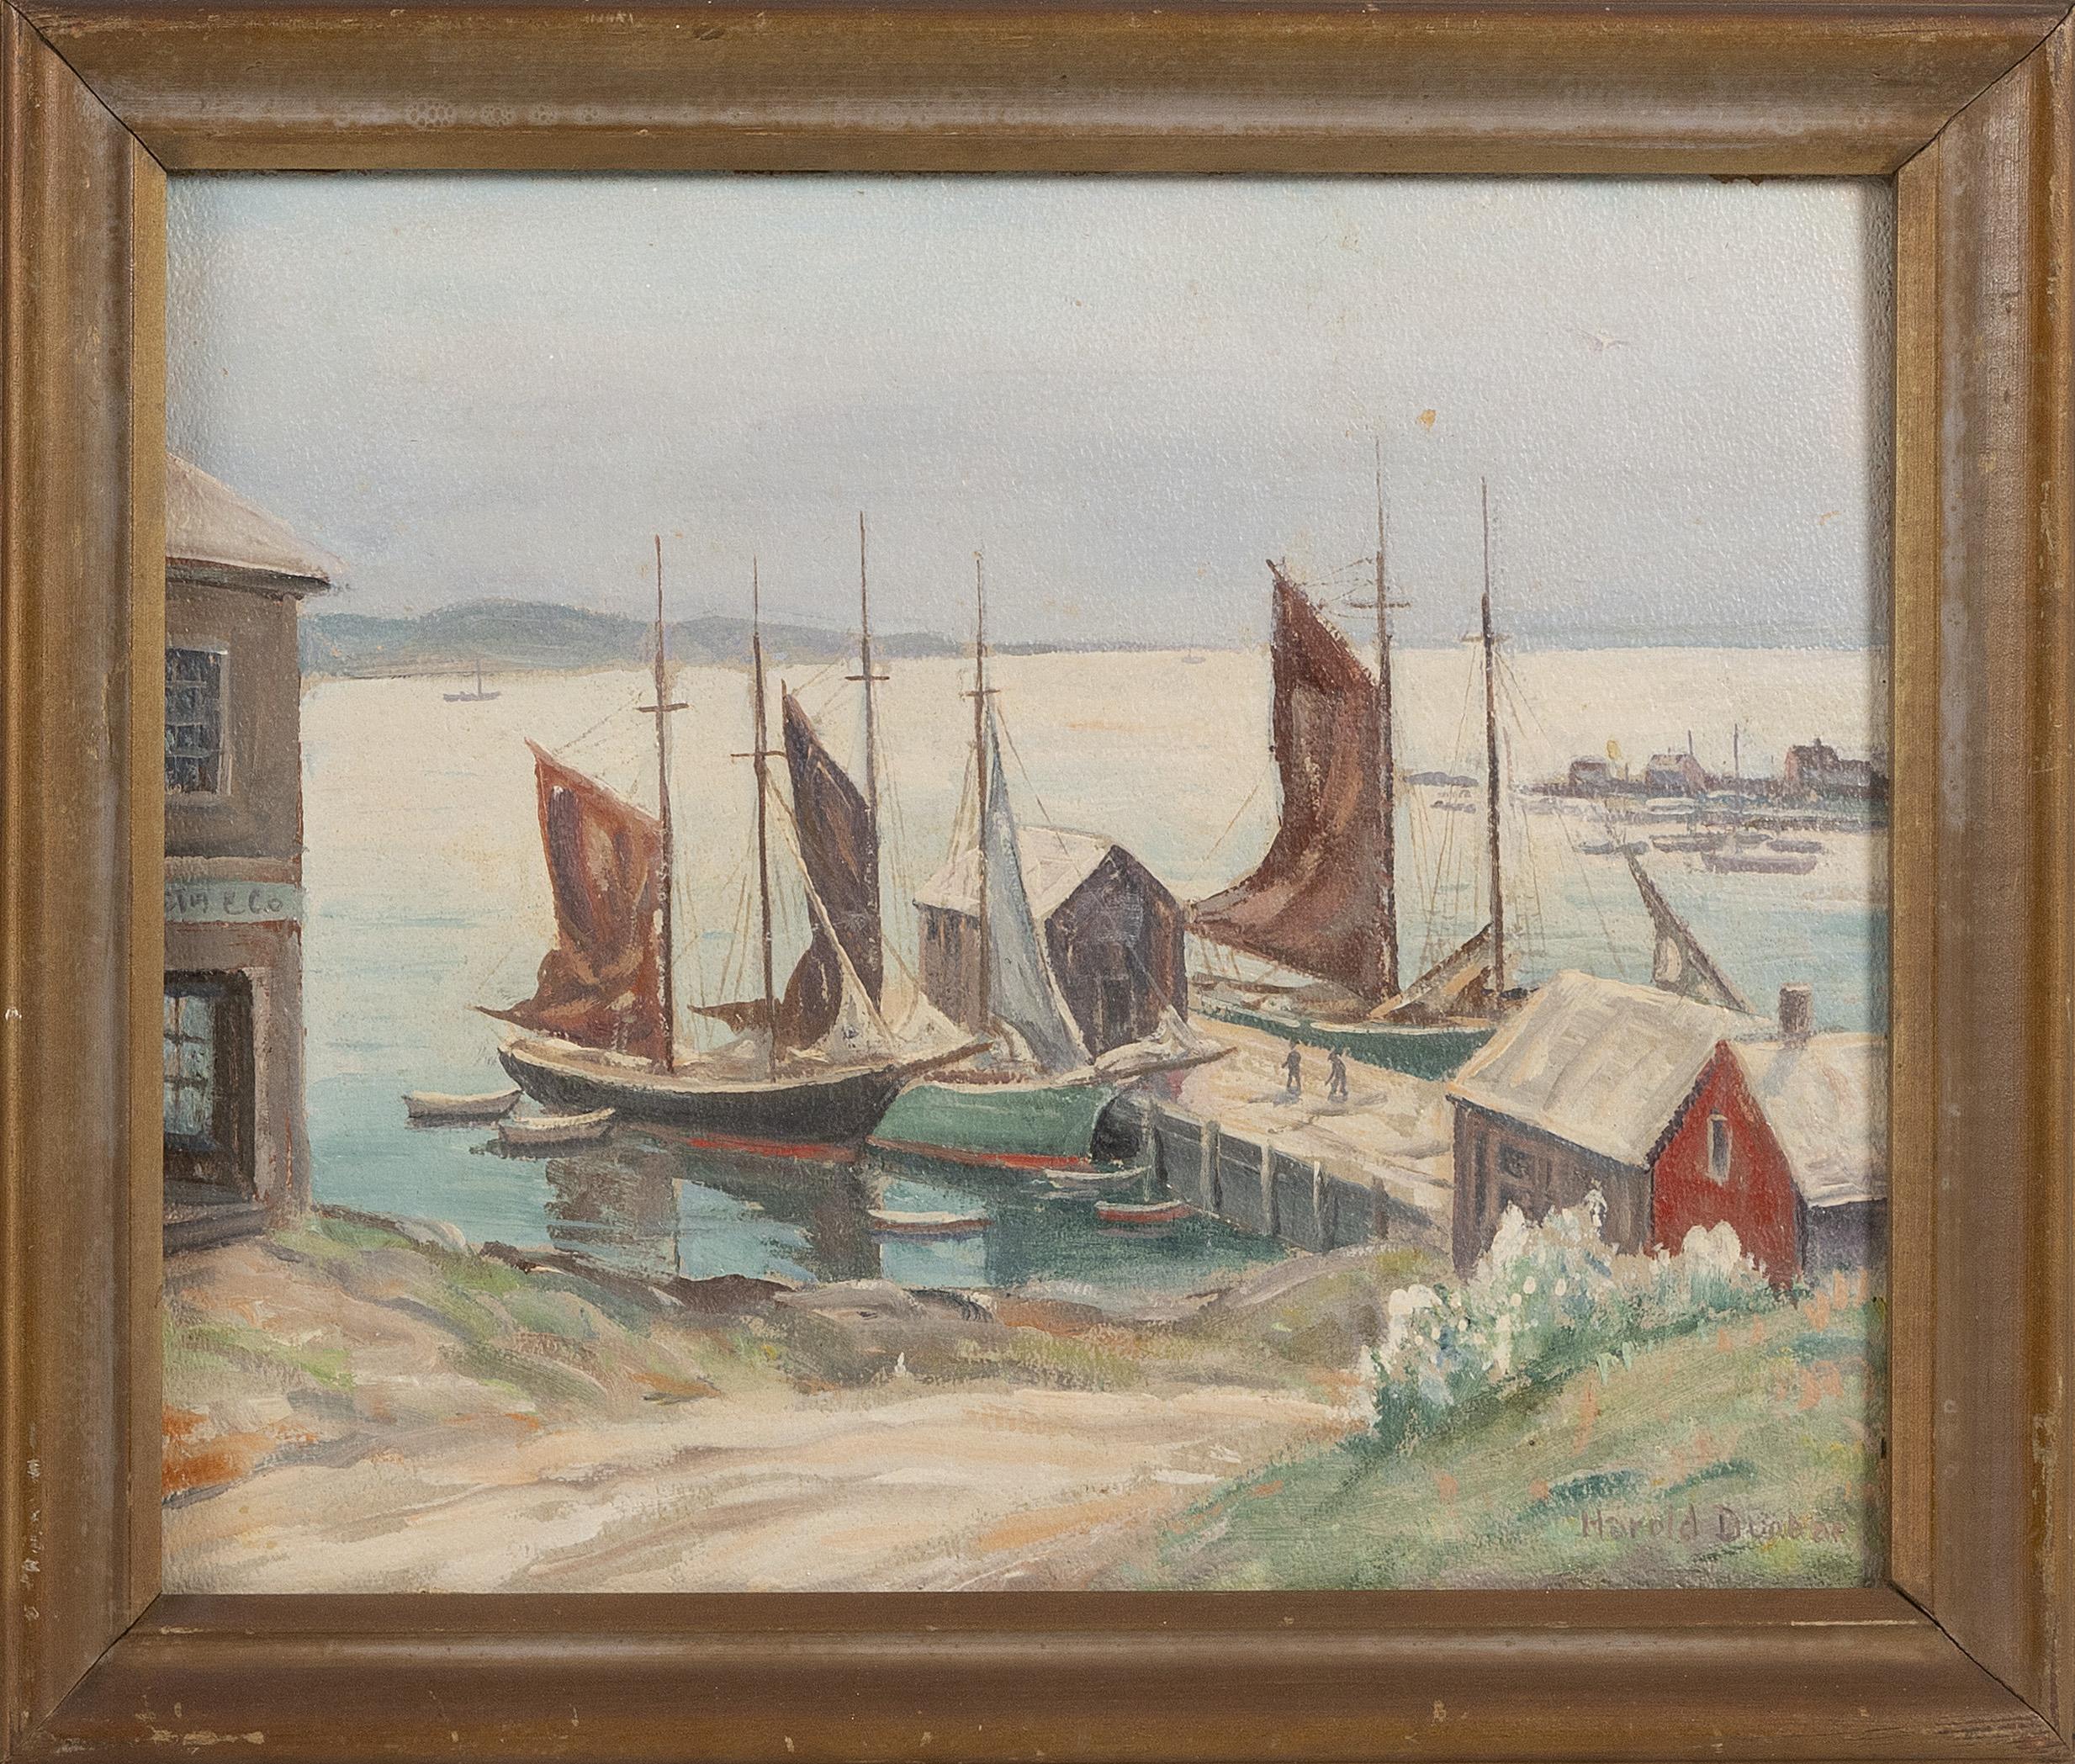 HAROLD DUNBAR (Massachusetts, 1882-1953),